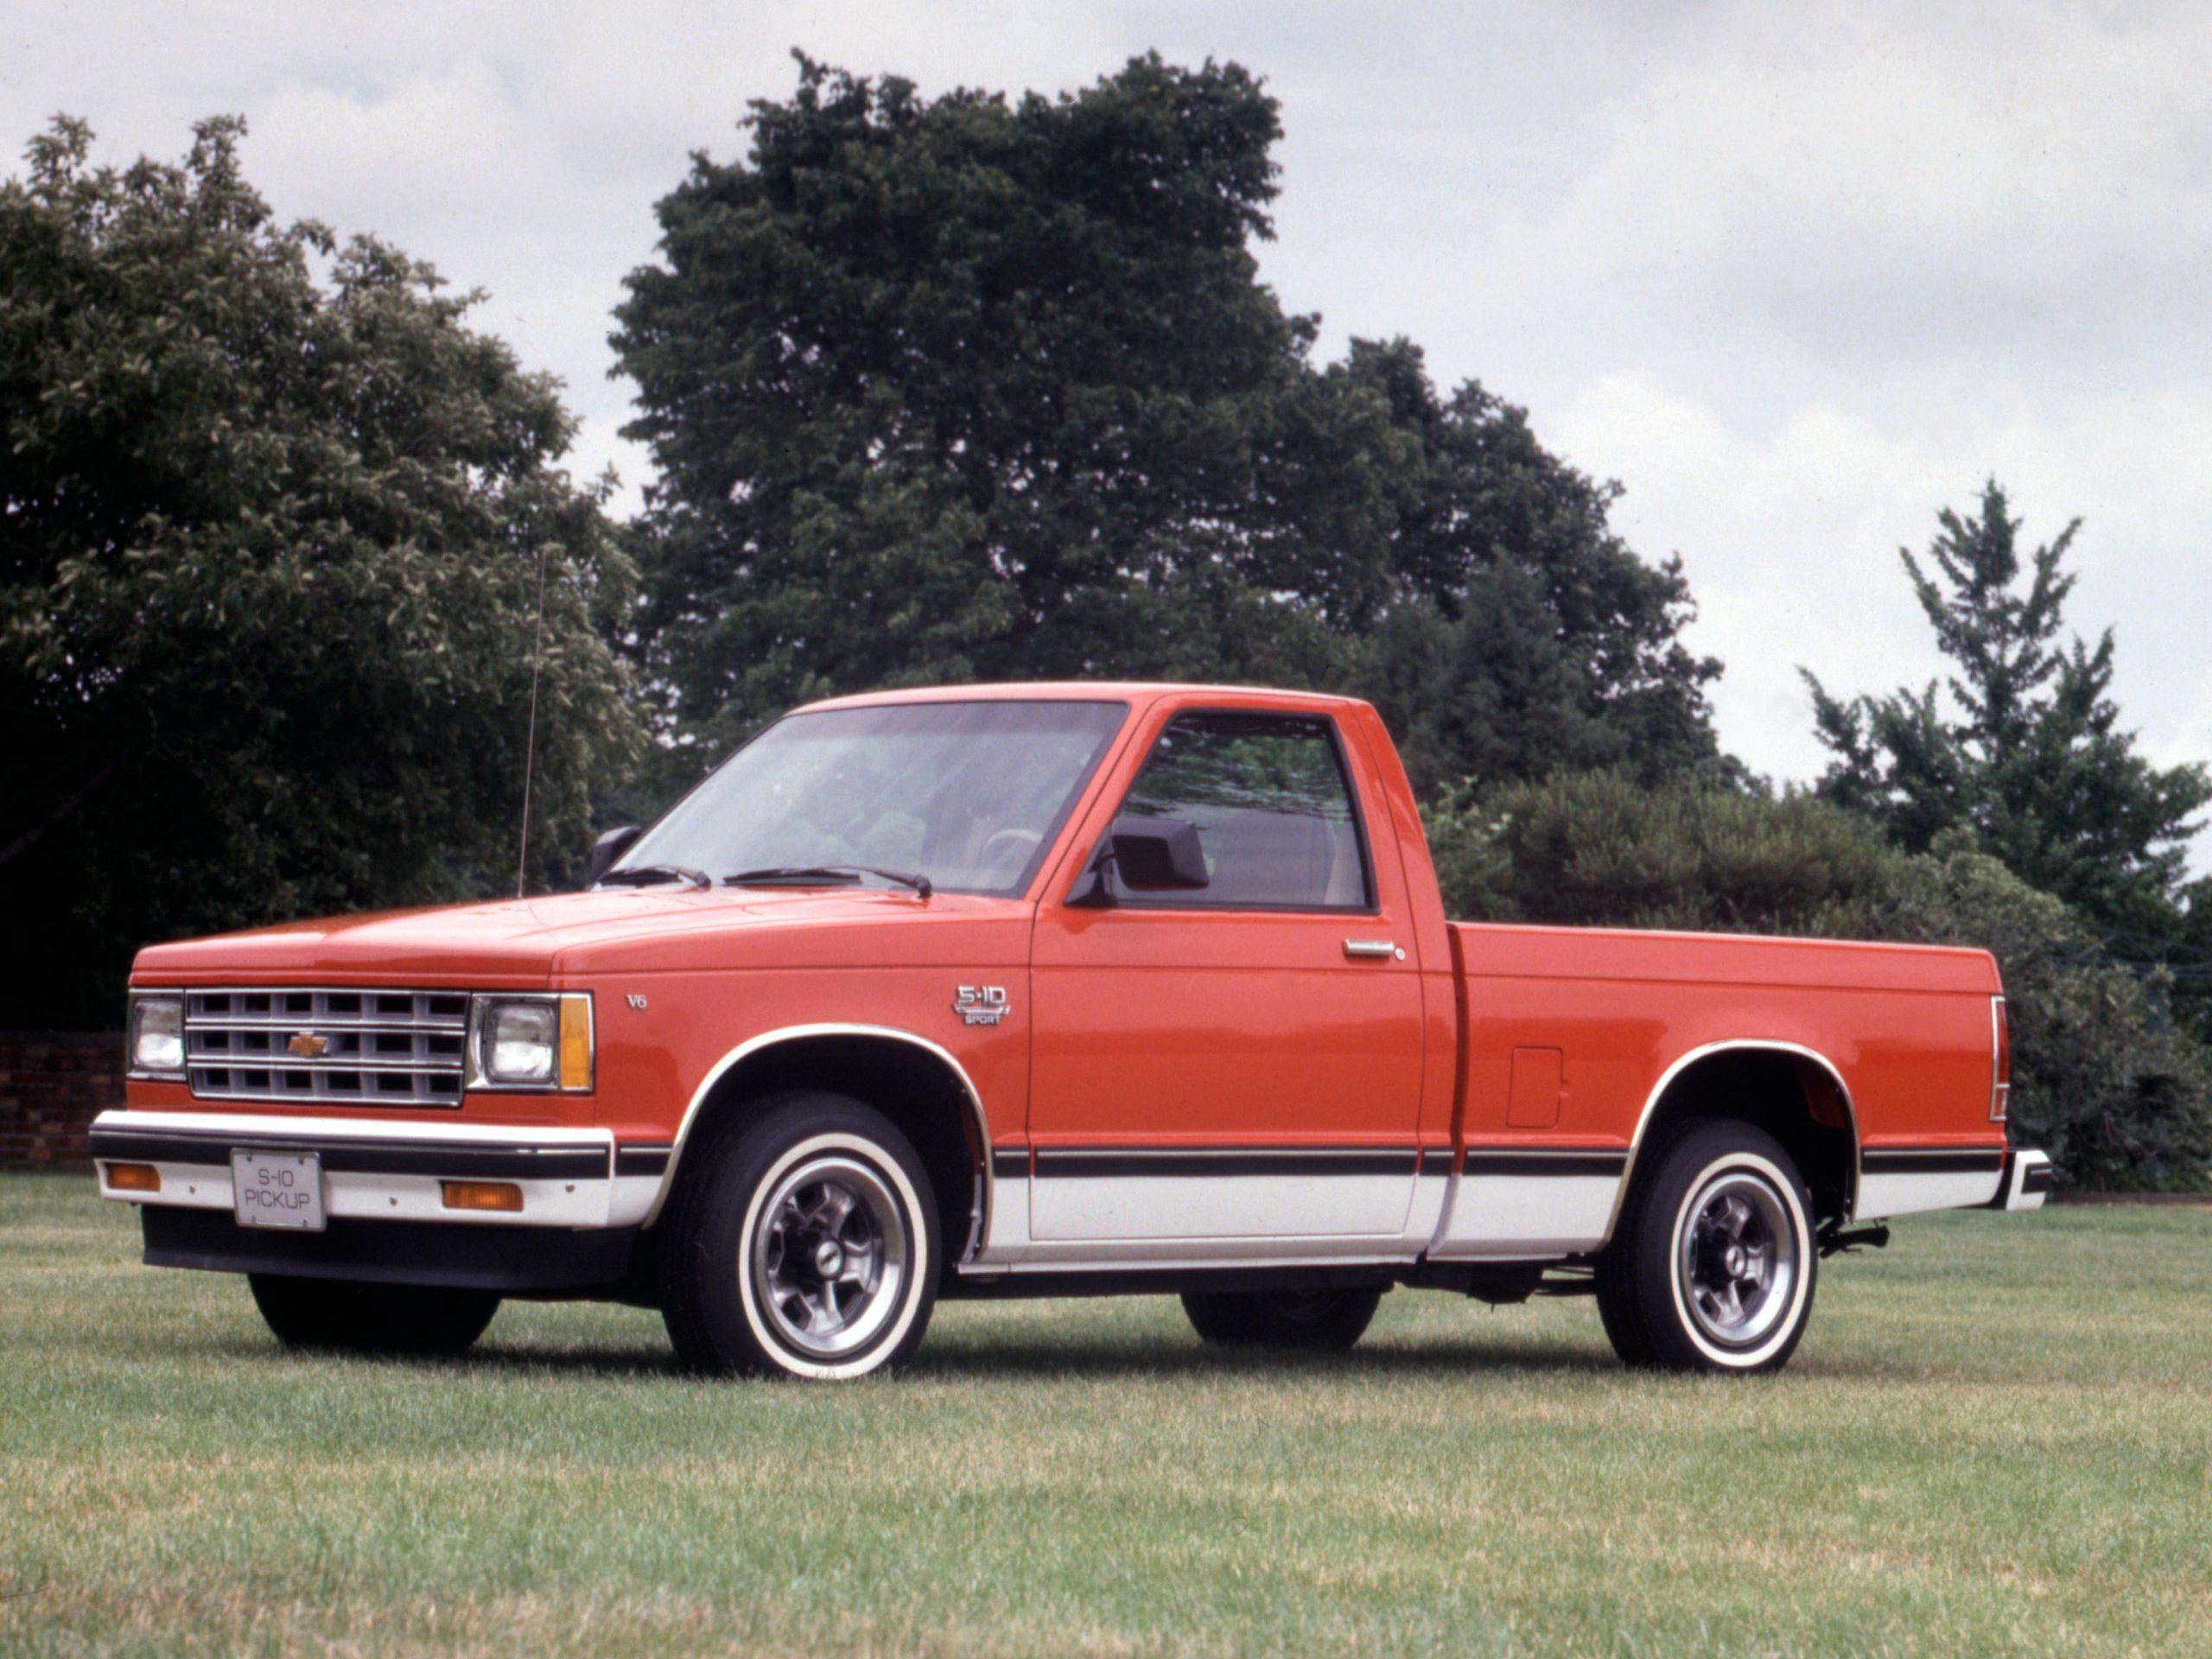 1982 Chevrolet S-10 Sport Pickup